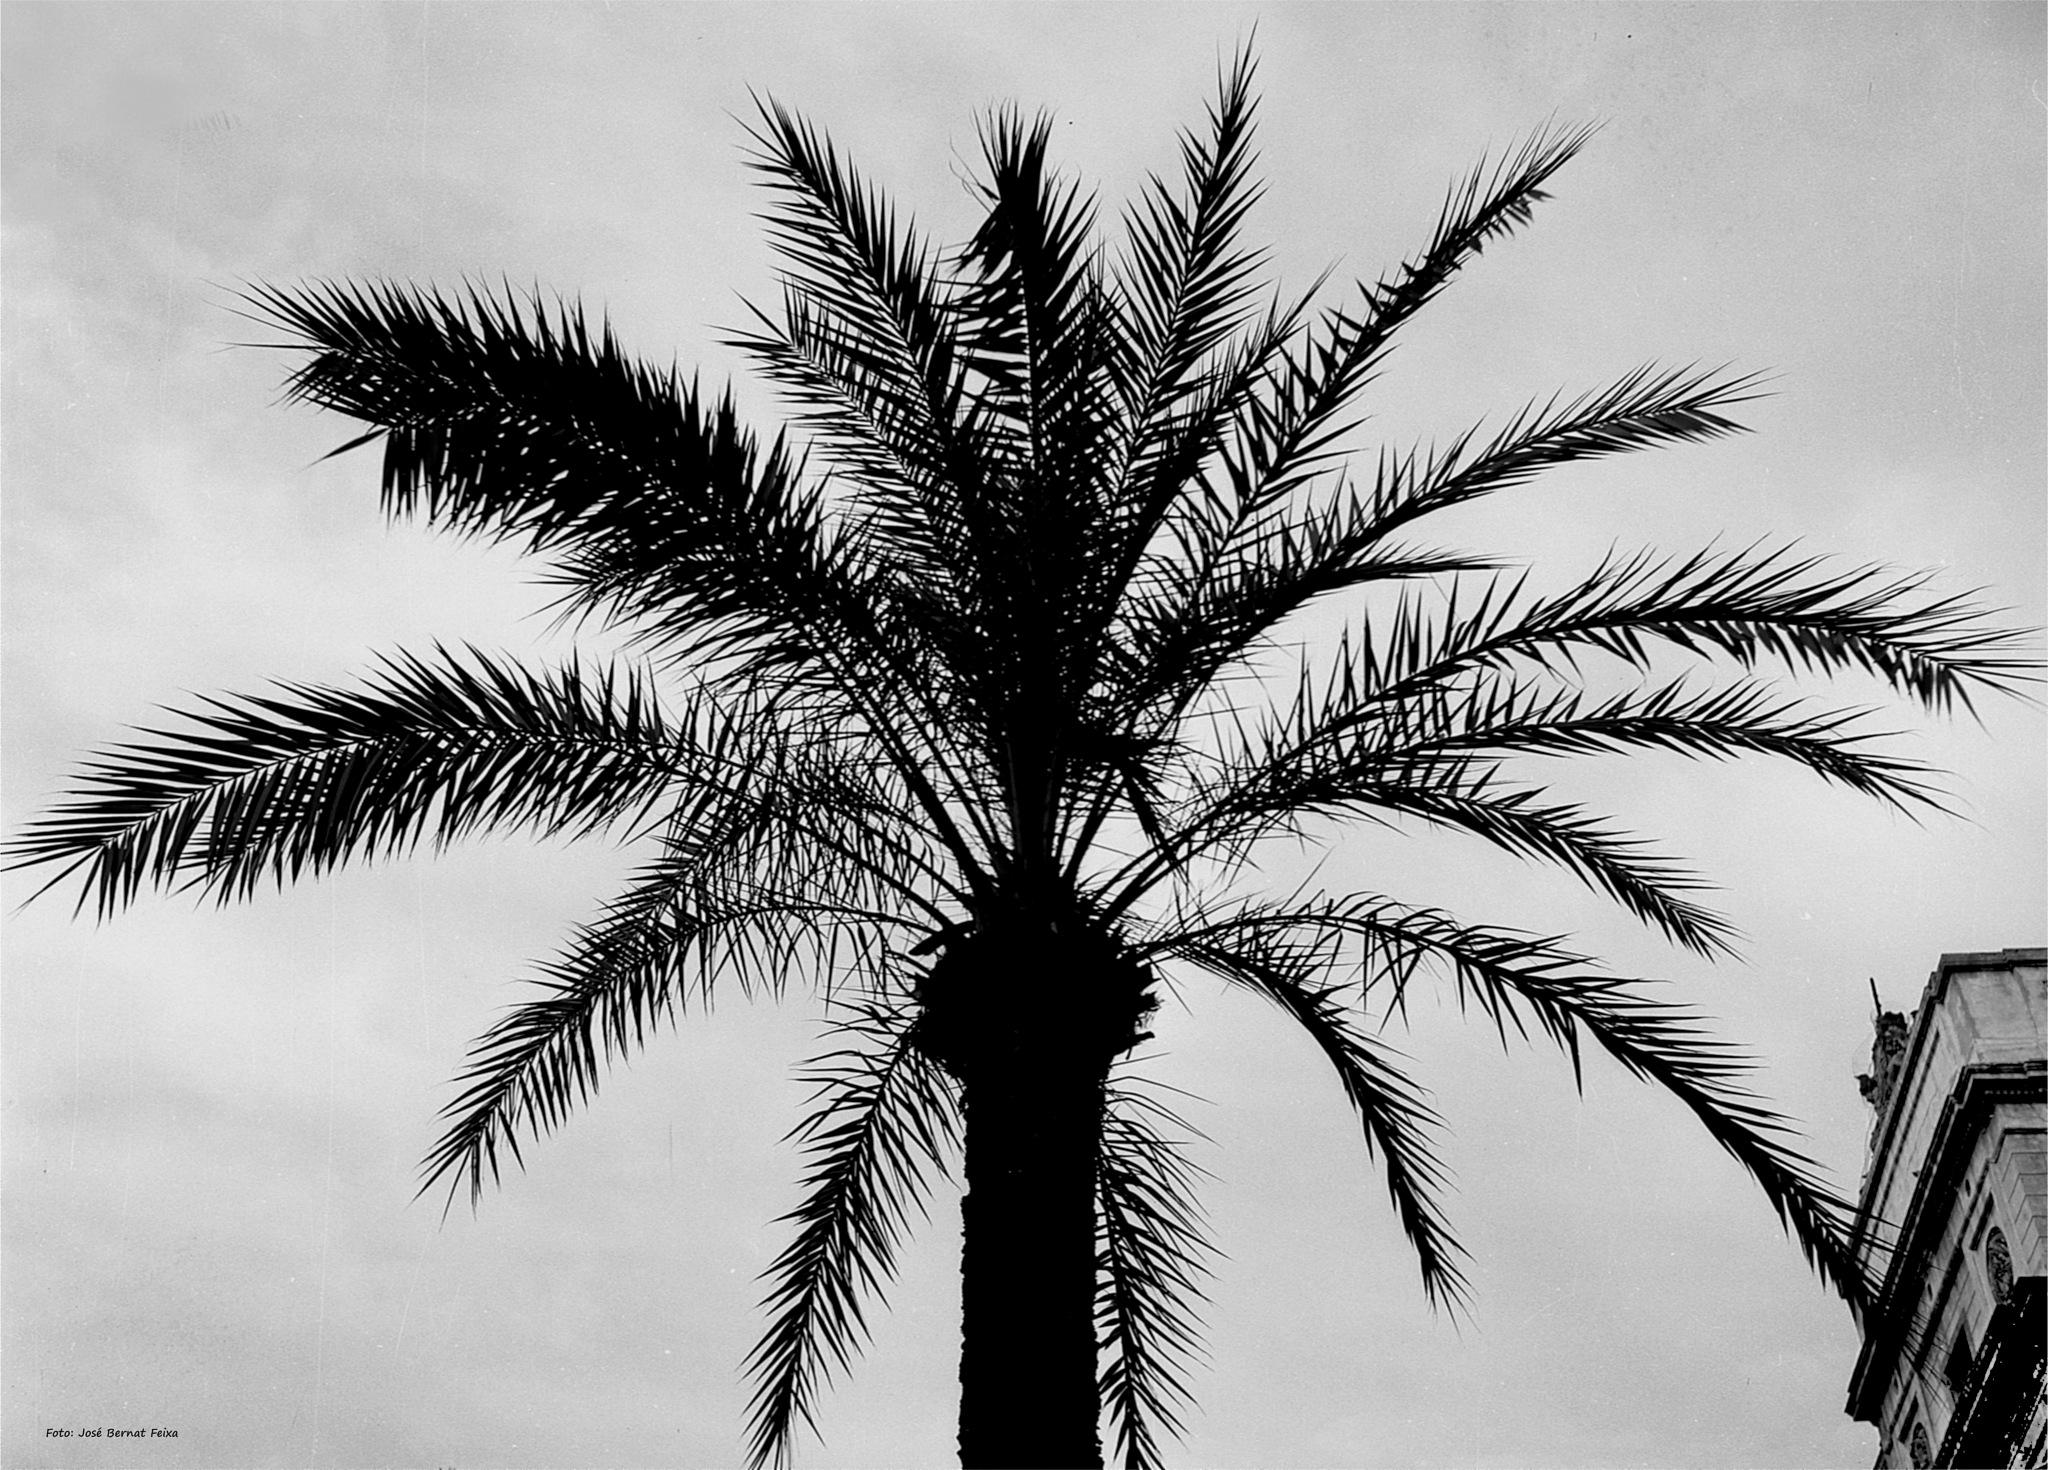 PALMERA ; PALMBOOM ; PALM TREE (60's) by José Bernat Feixa